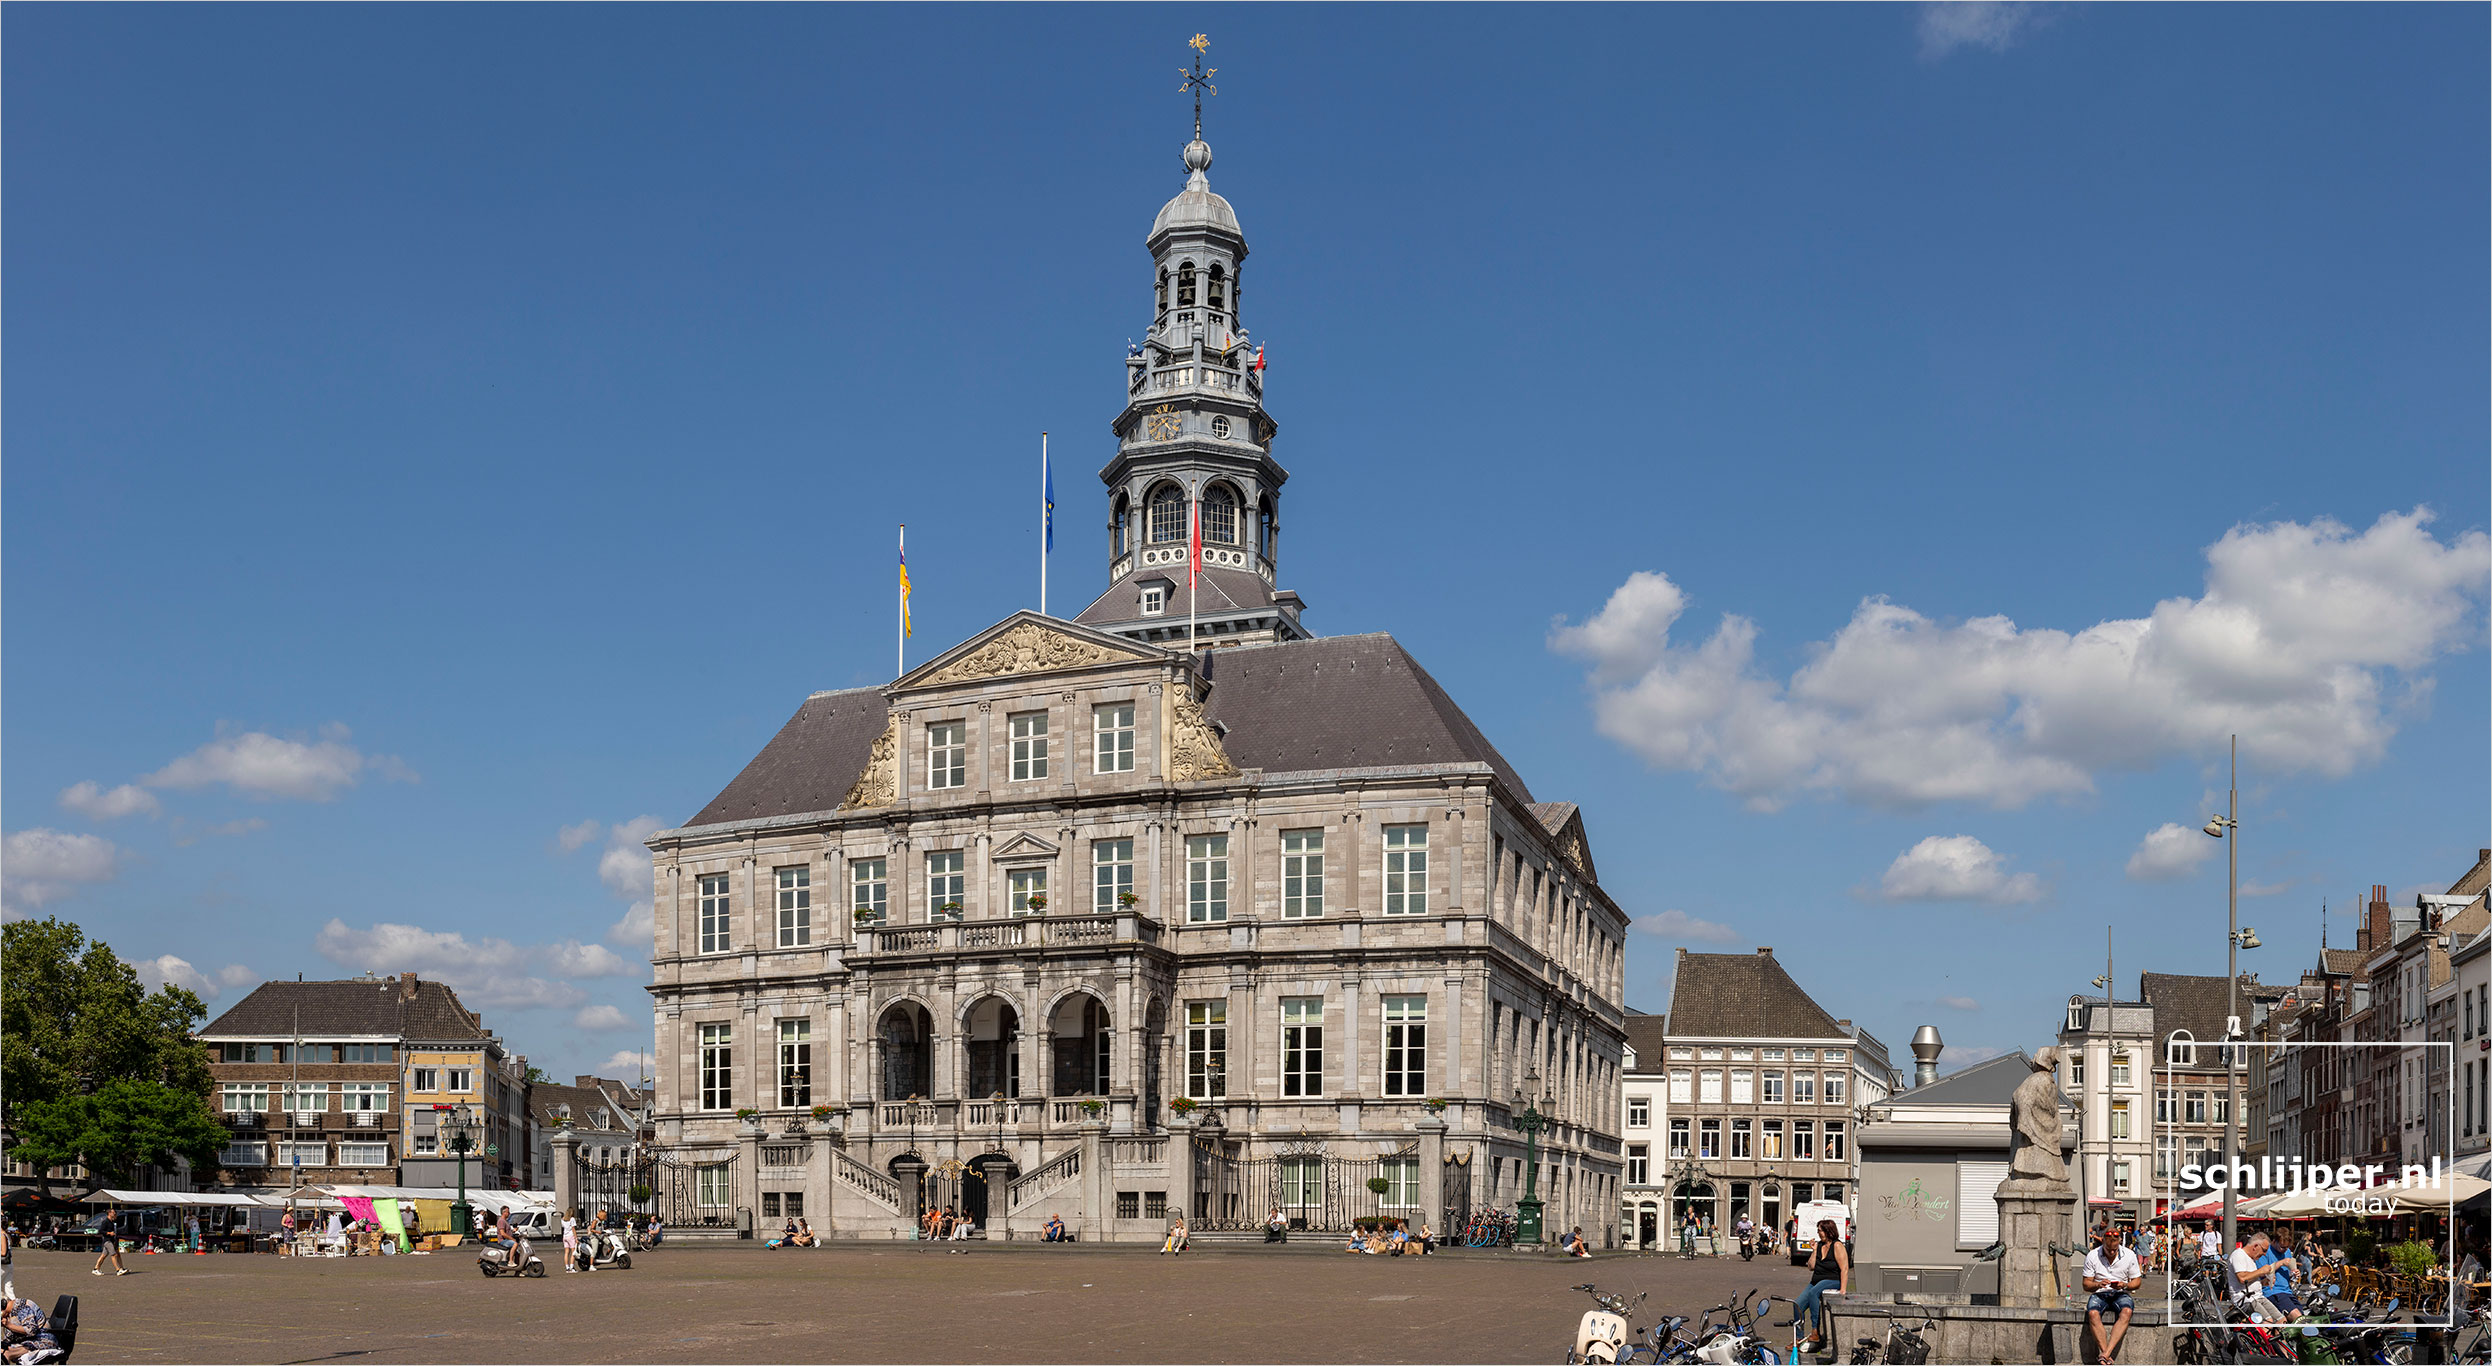 The Netherlands, Maastricht, 18 juli 2021